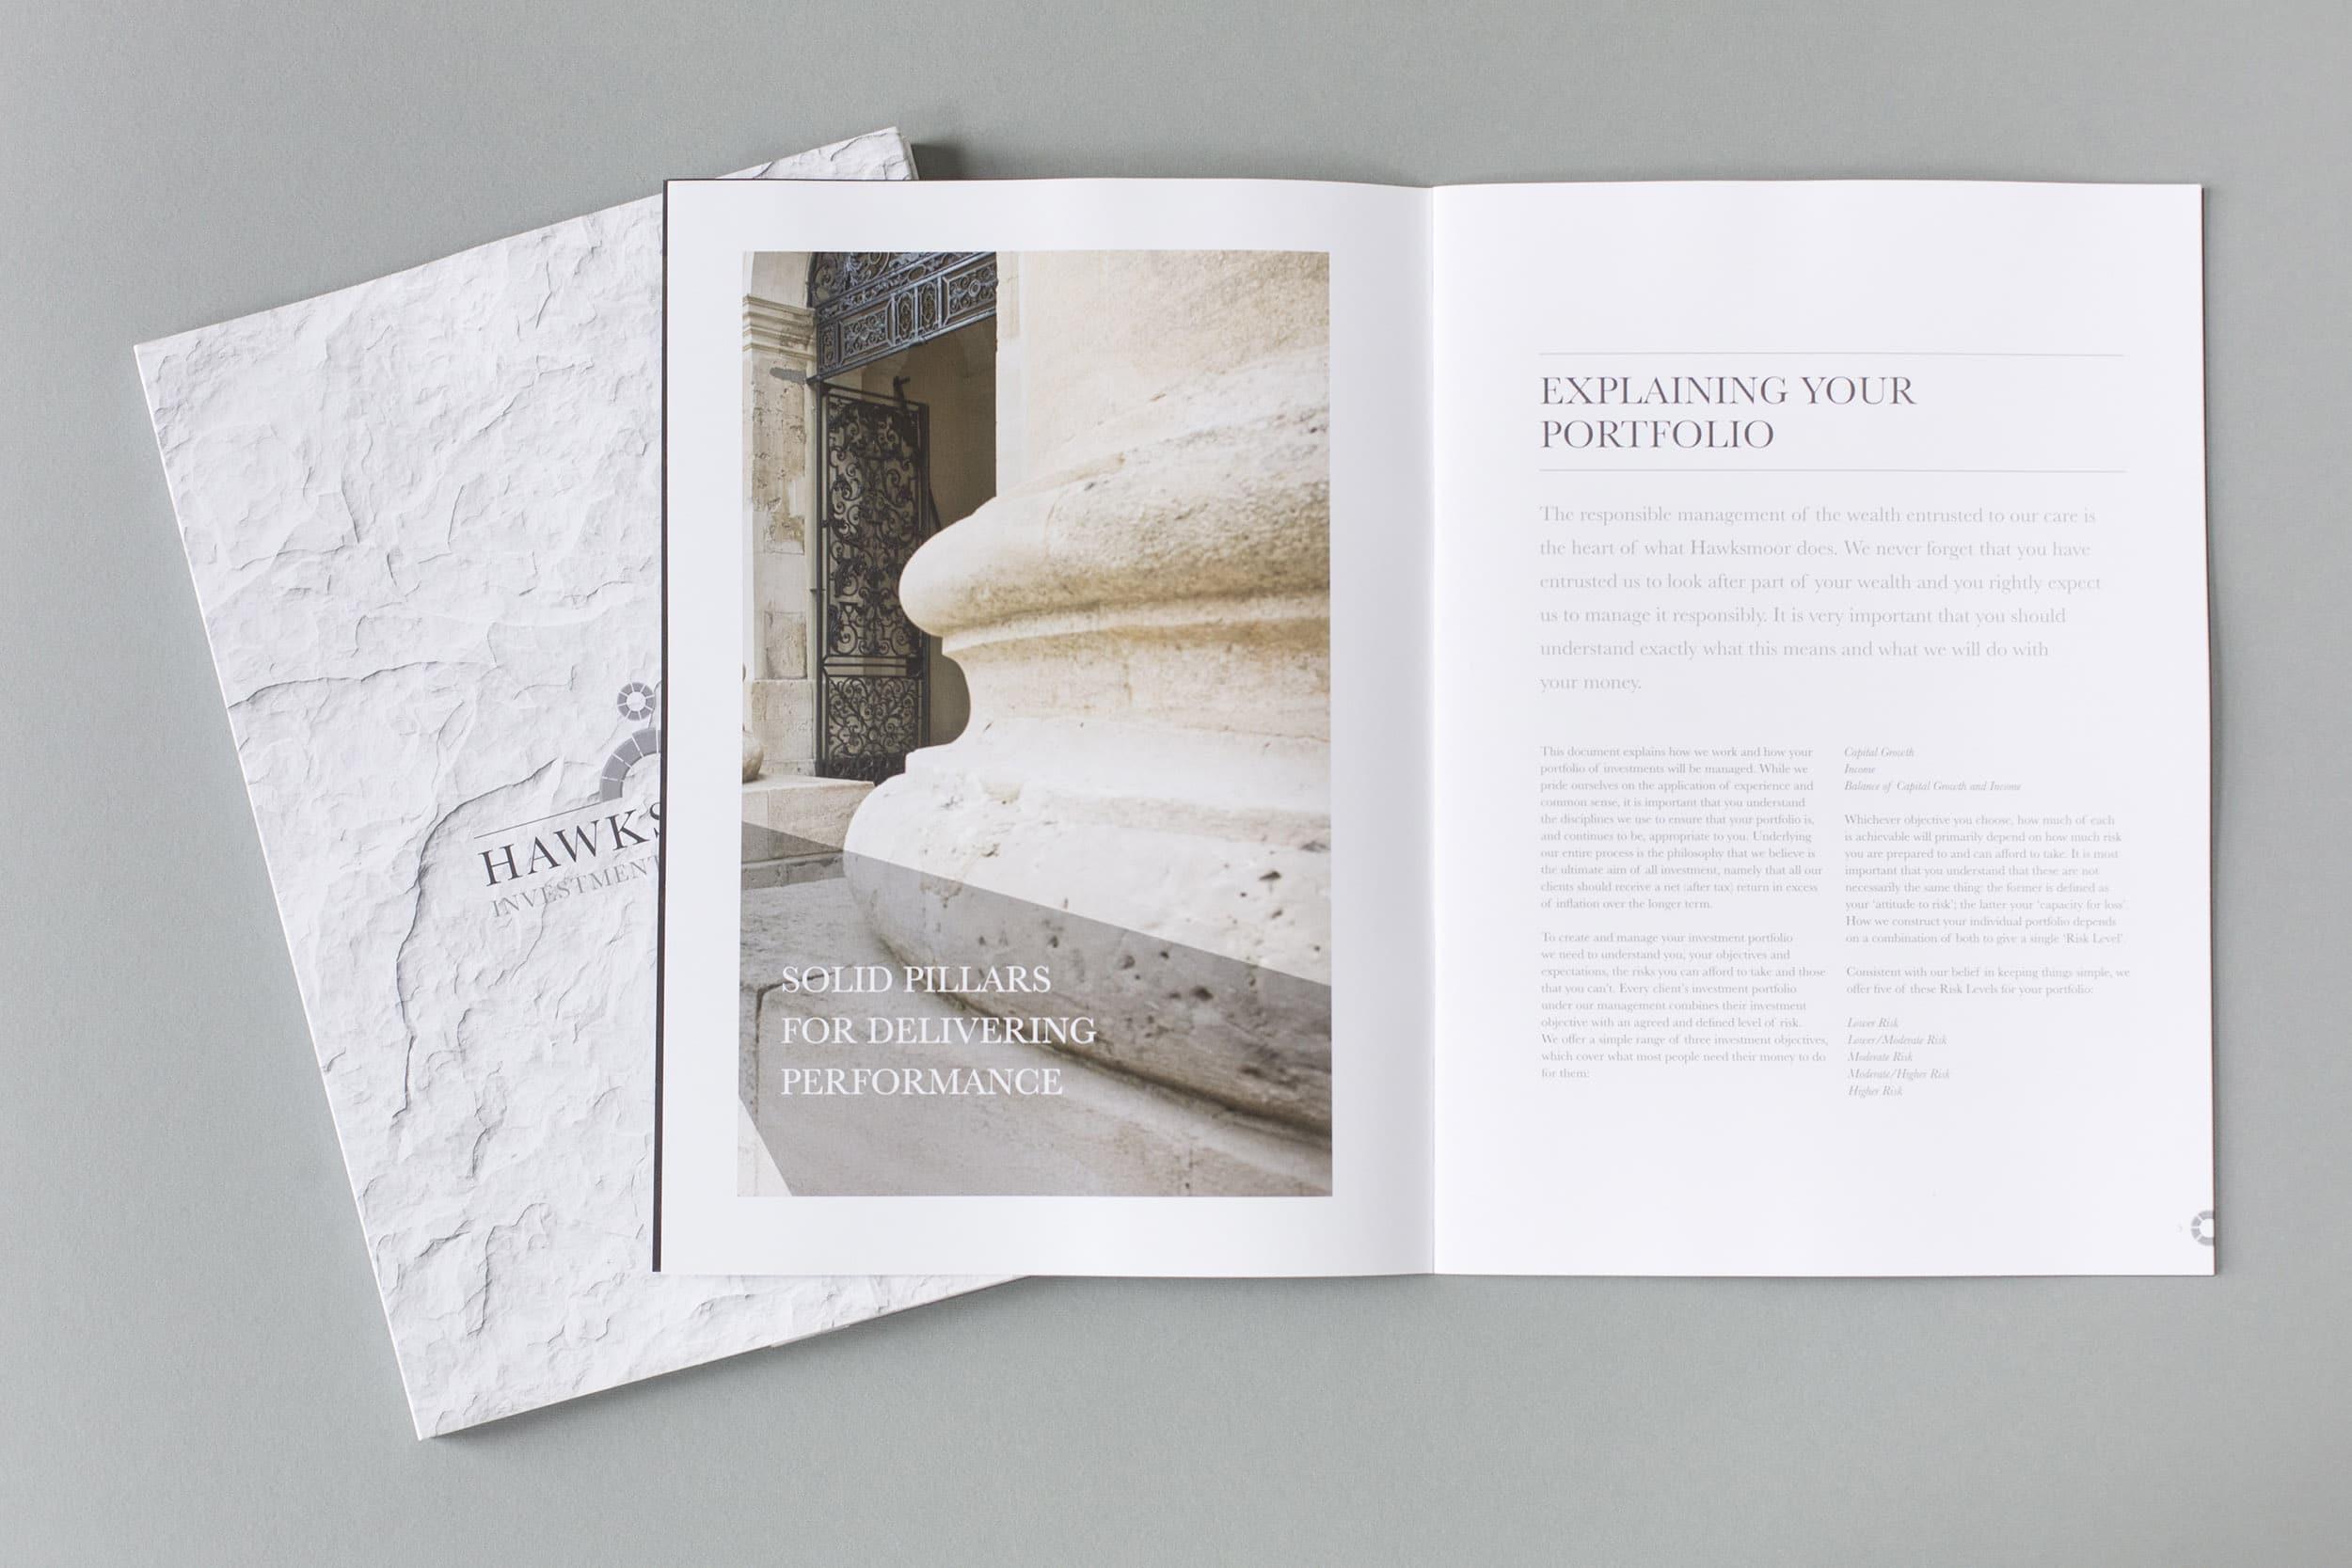 Hawksmoor design and print project